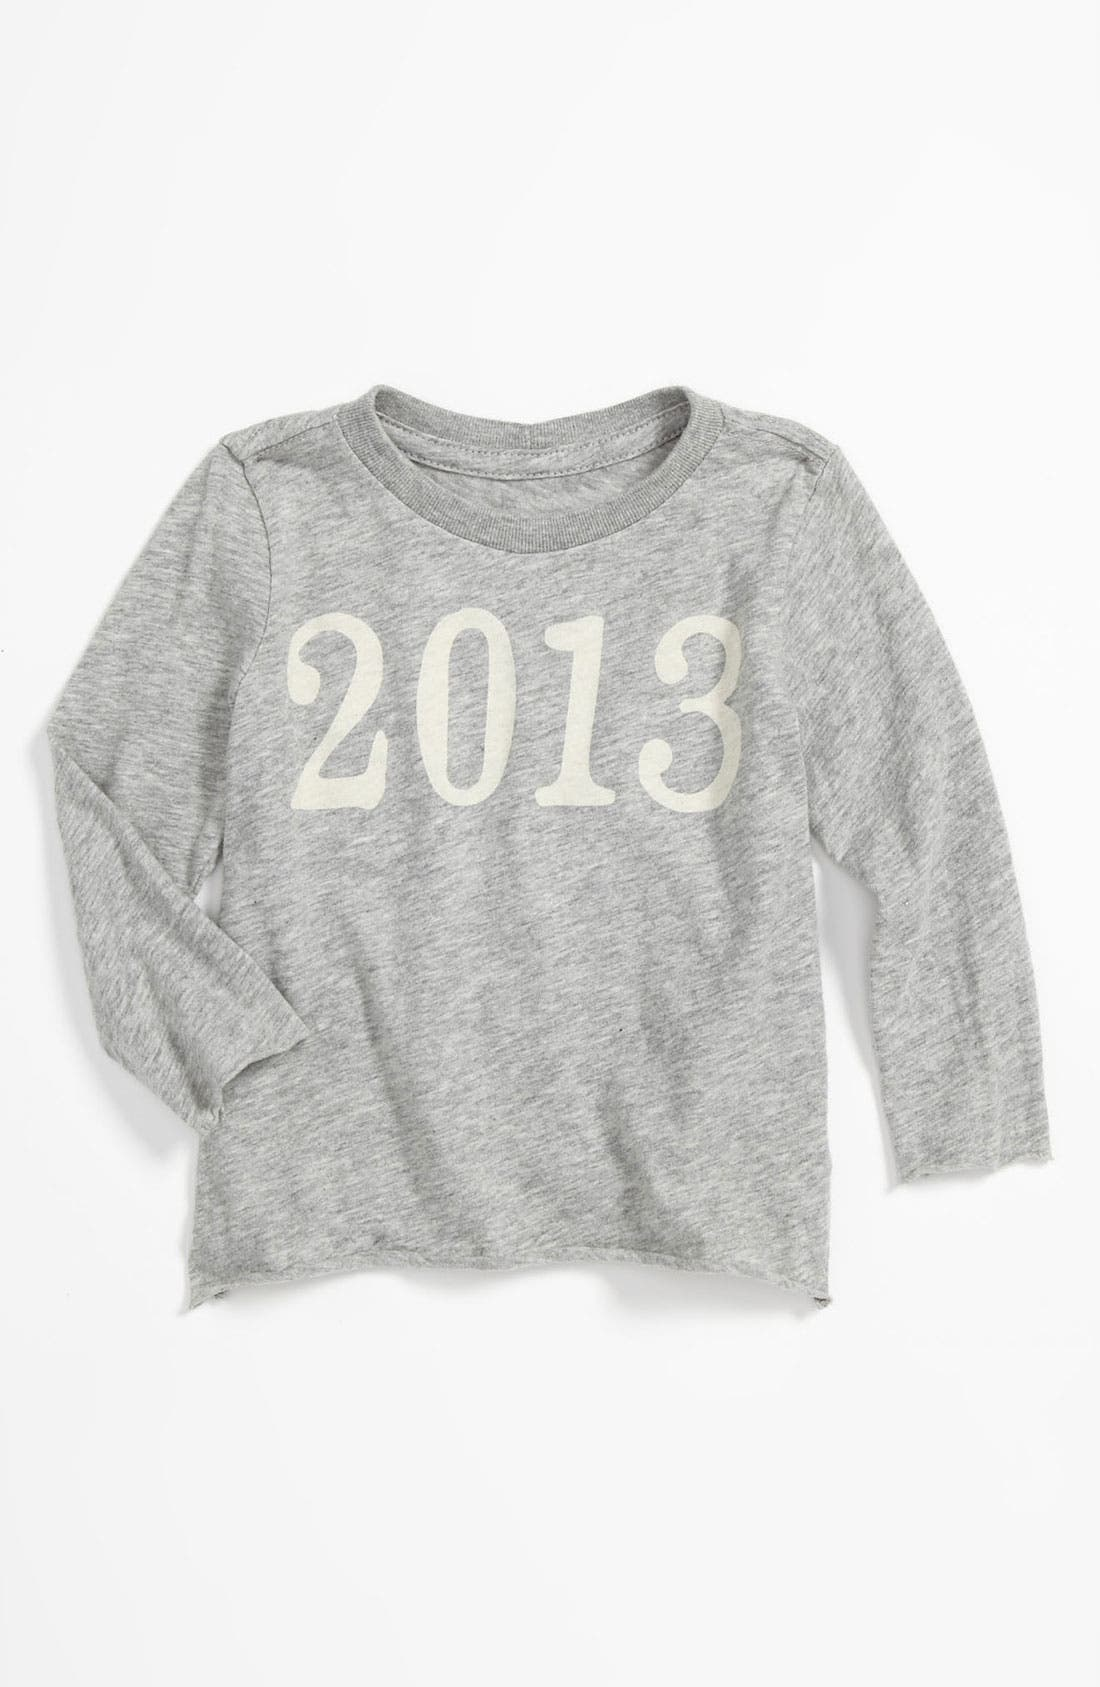 Main Image - Peek 'Little Peanut - 2013' T-Shirt (Baby)